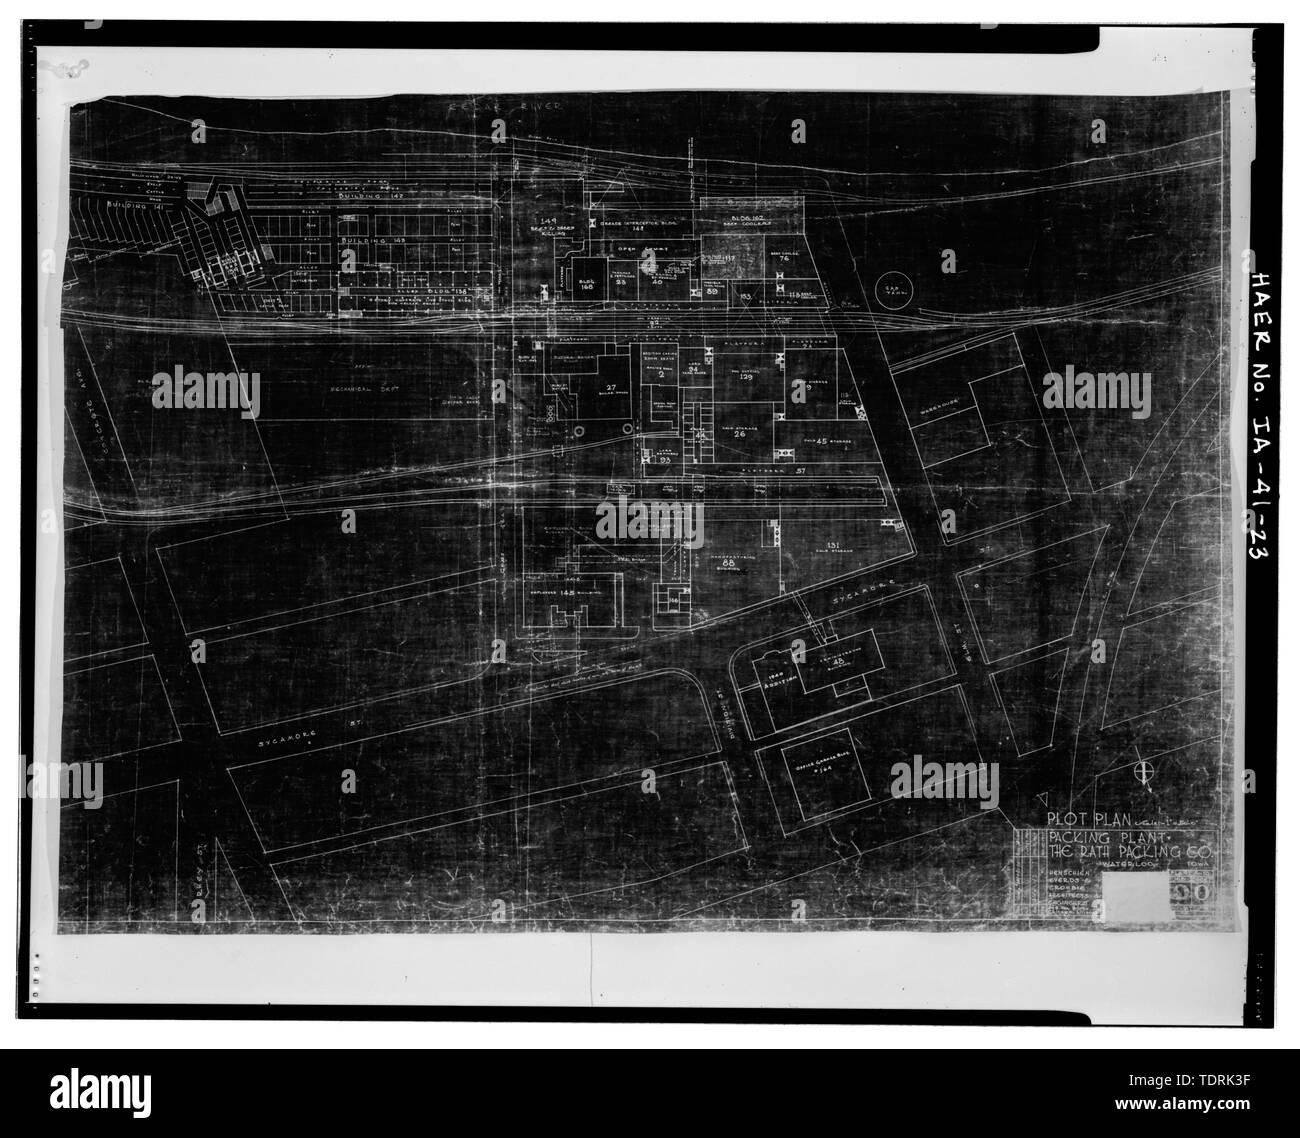 Datazione Blueprint